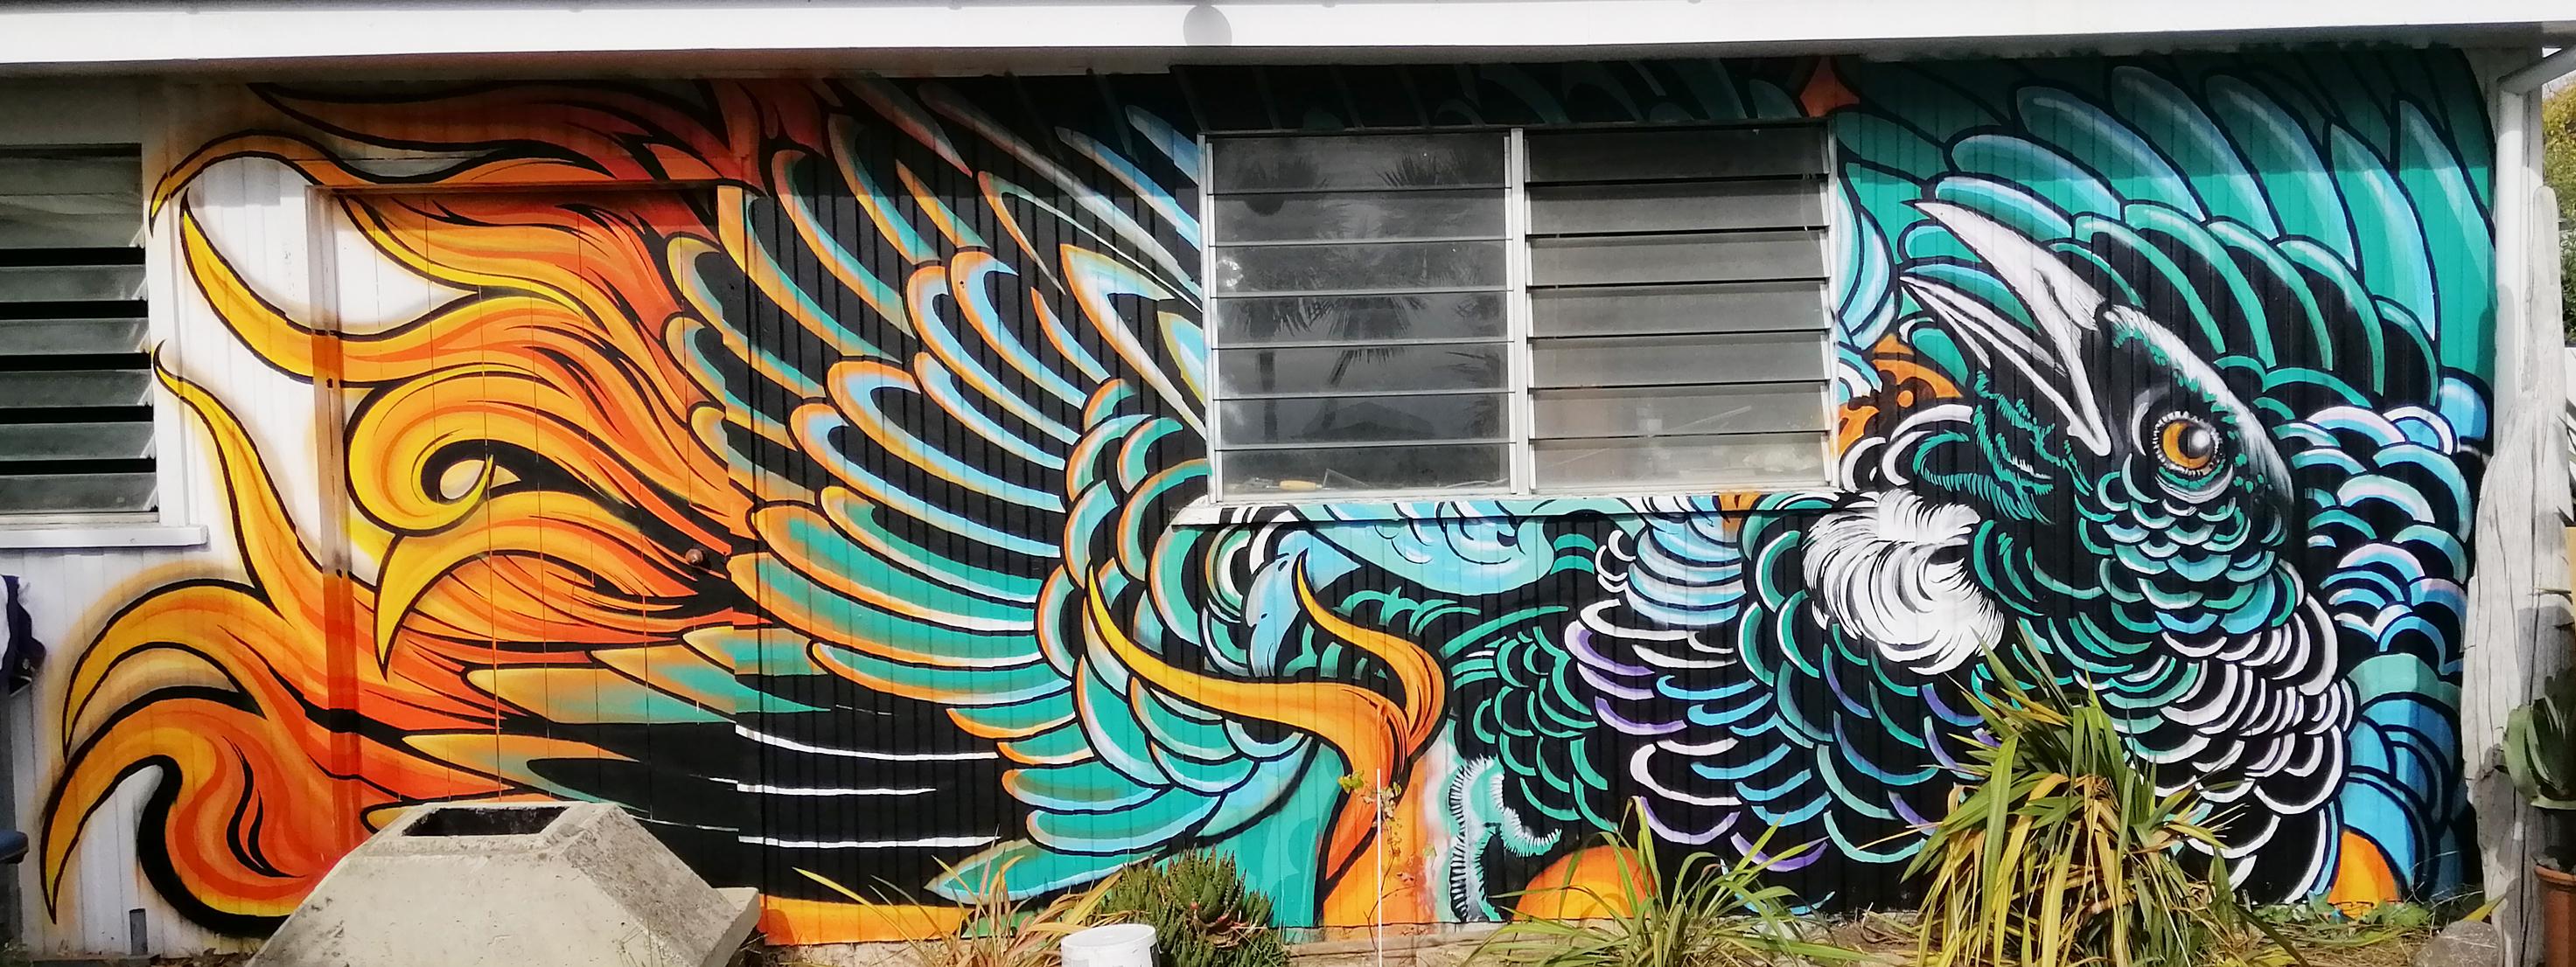 home mural 1 copy